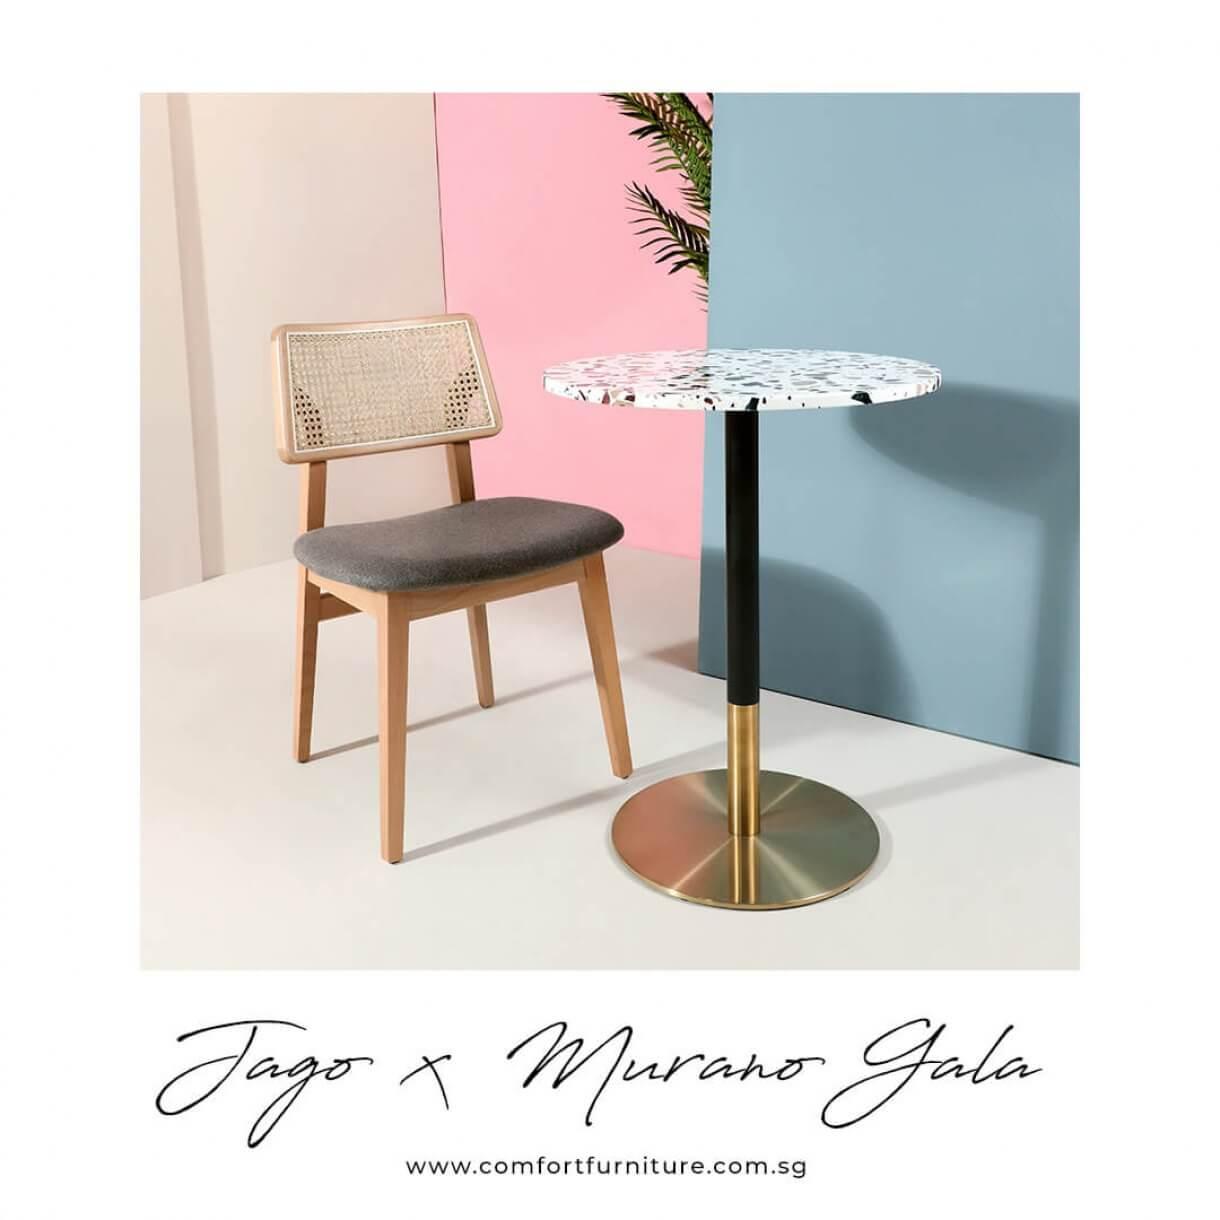 Vintage Interior Design Ideas with Jago Barchair - Comfort Furniture